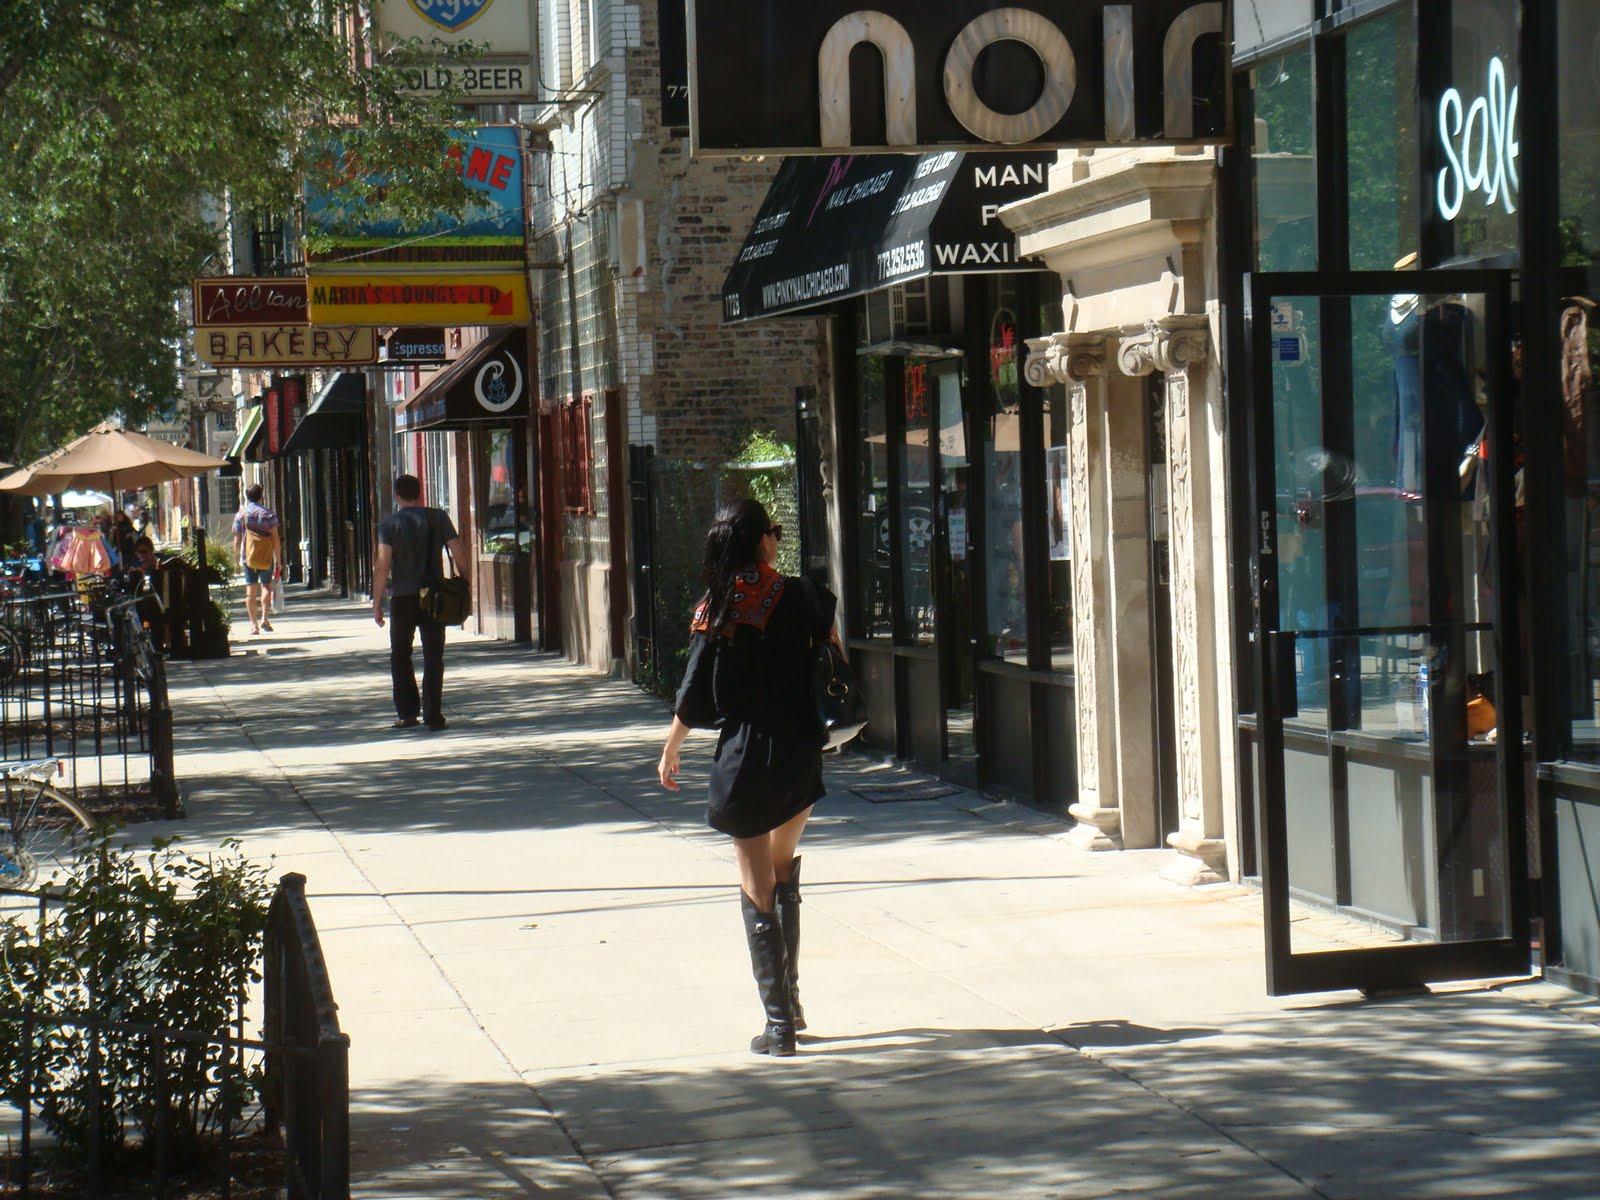 Buying Large Neighborhood Property Renovating And Making It Unaffordable